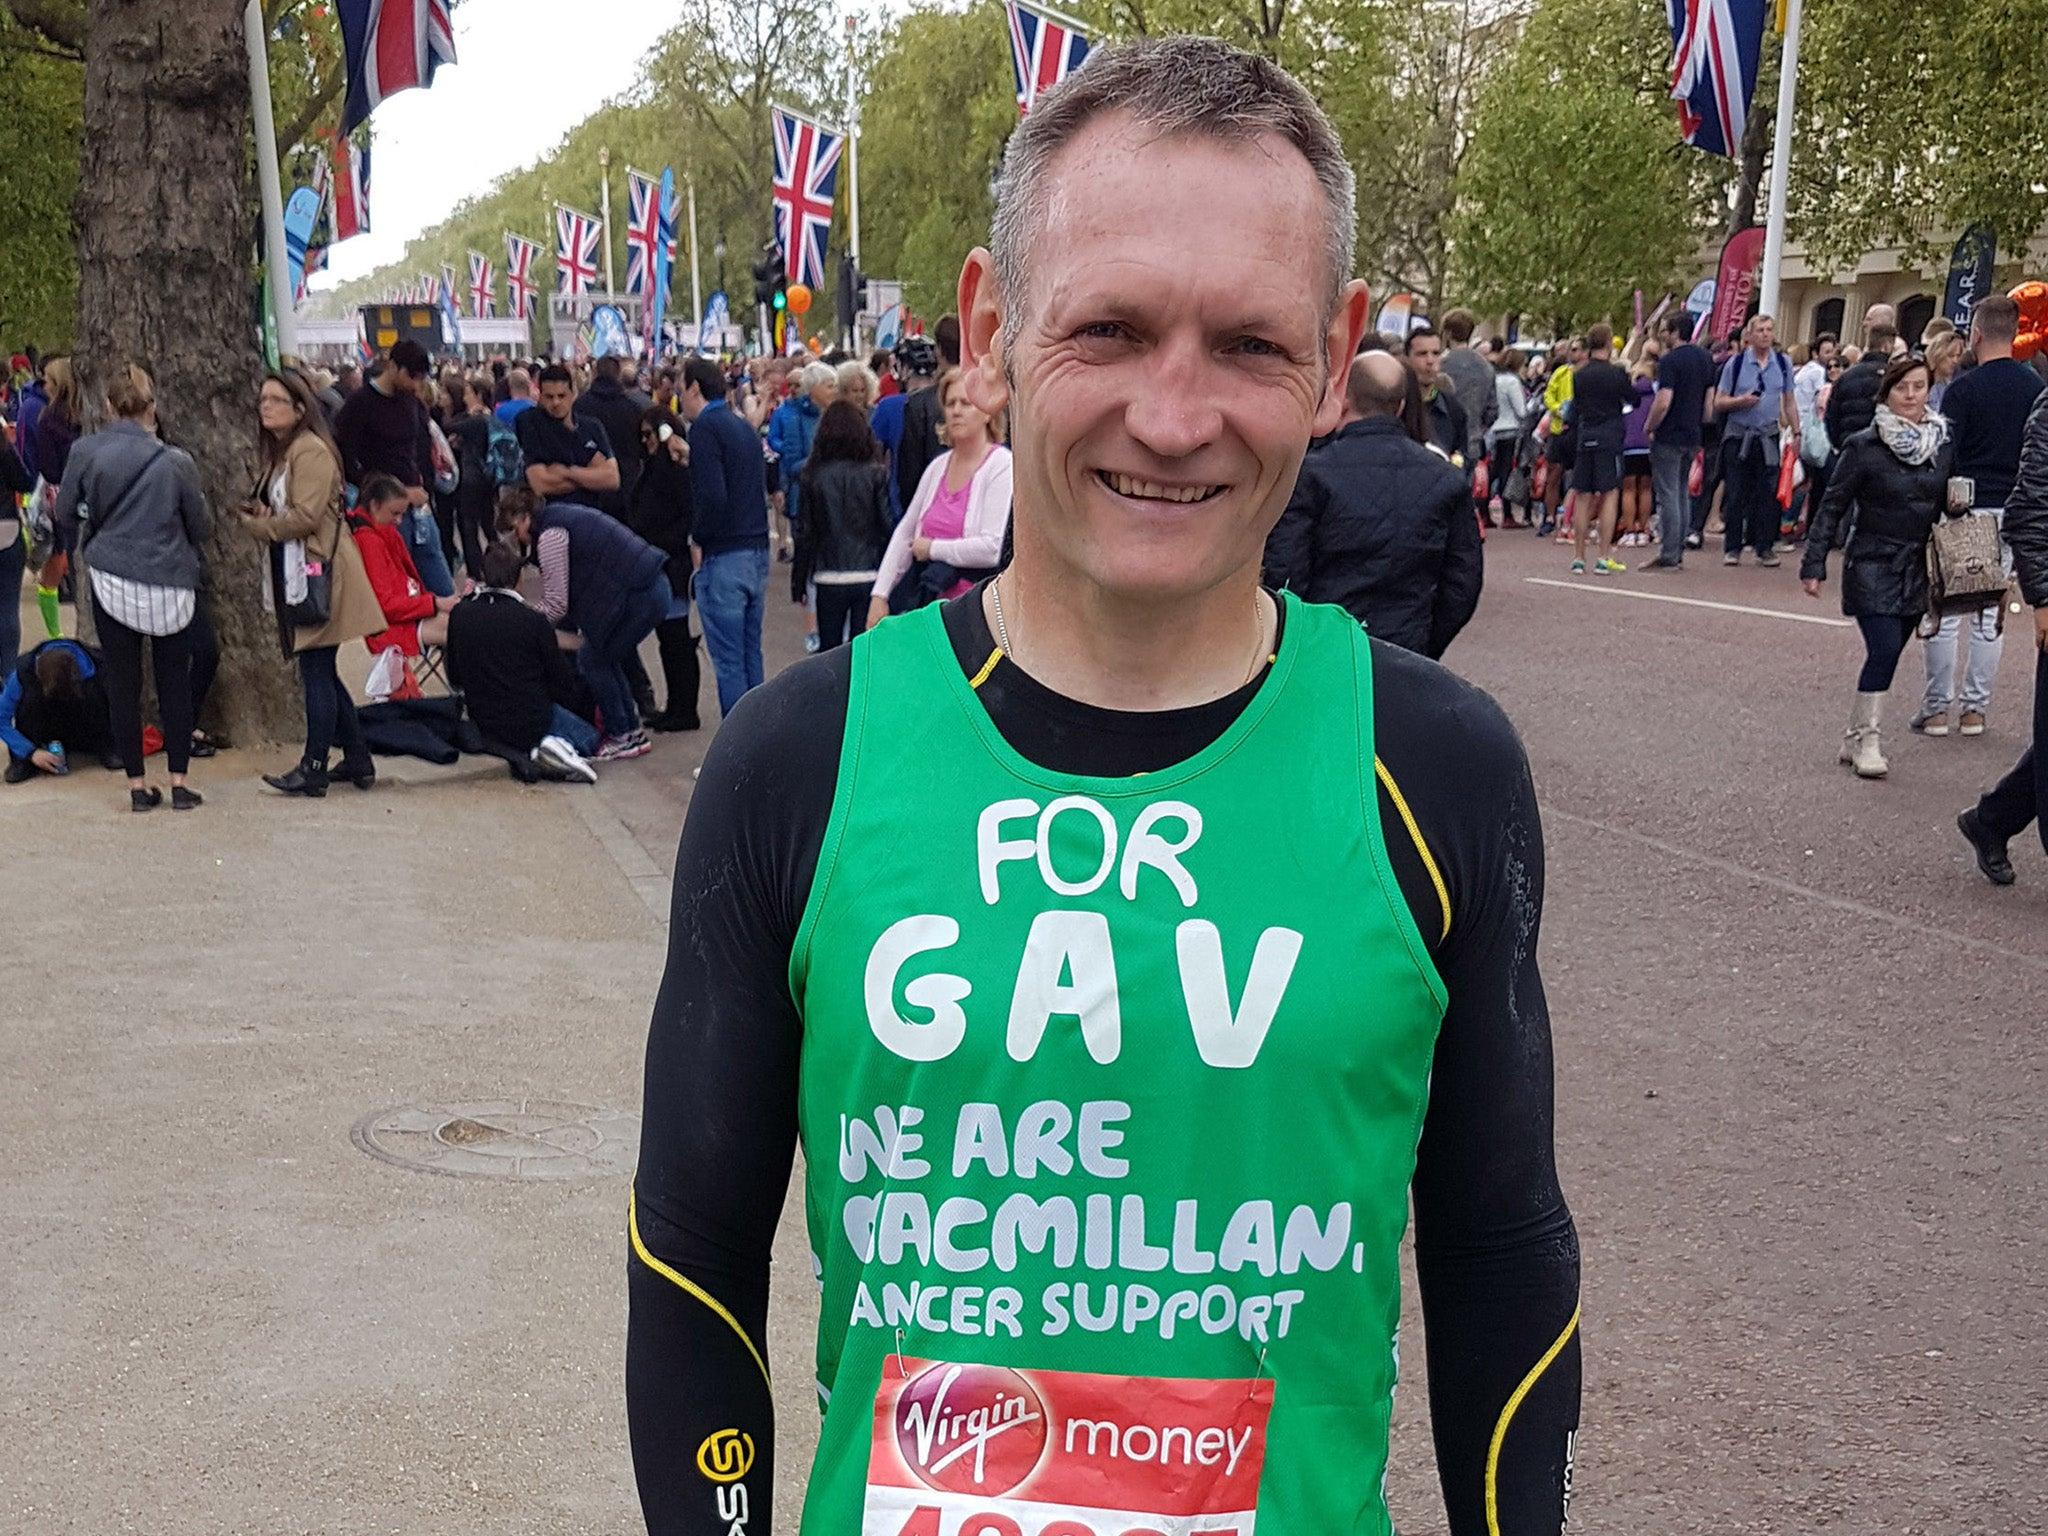 60a3888cd0 London Marathon 2017: meet Gary McKee, the man running 100 marathons ...